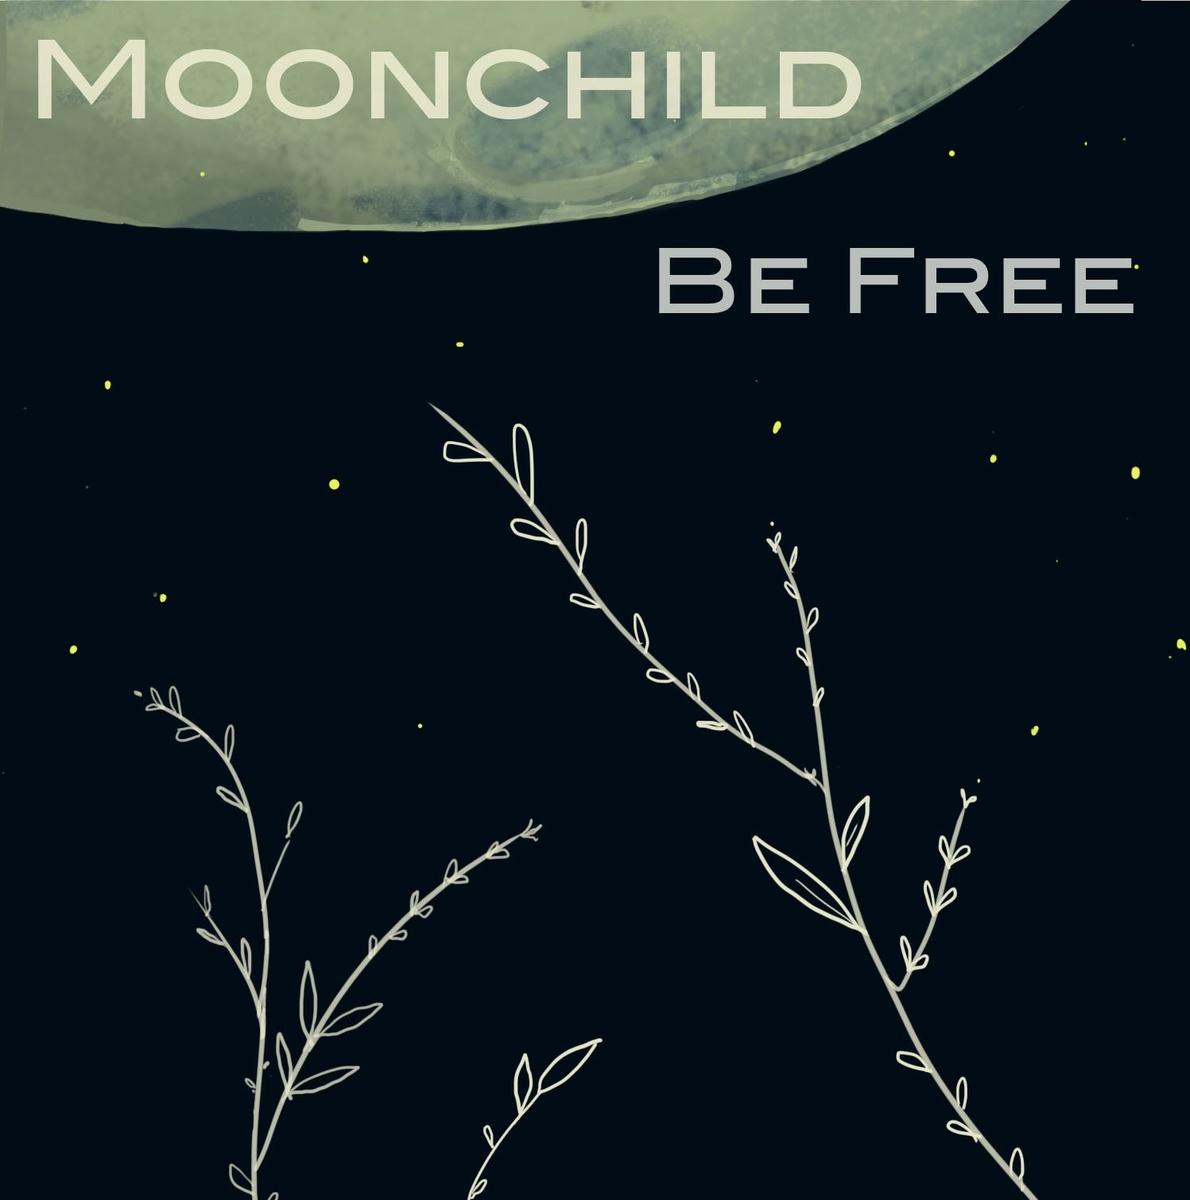 Moonchild – Be Free (DJ Jazzy Jeff and James Poyser Remix)